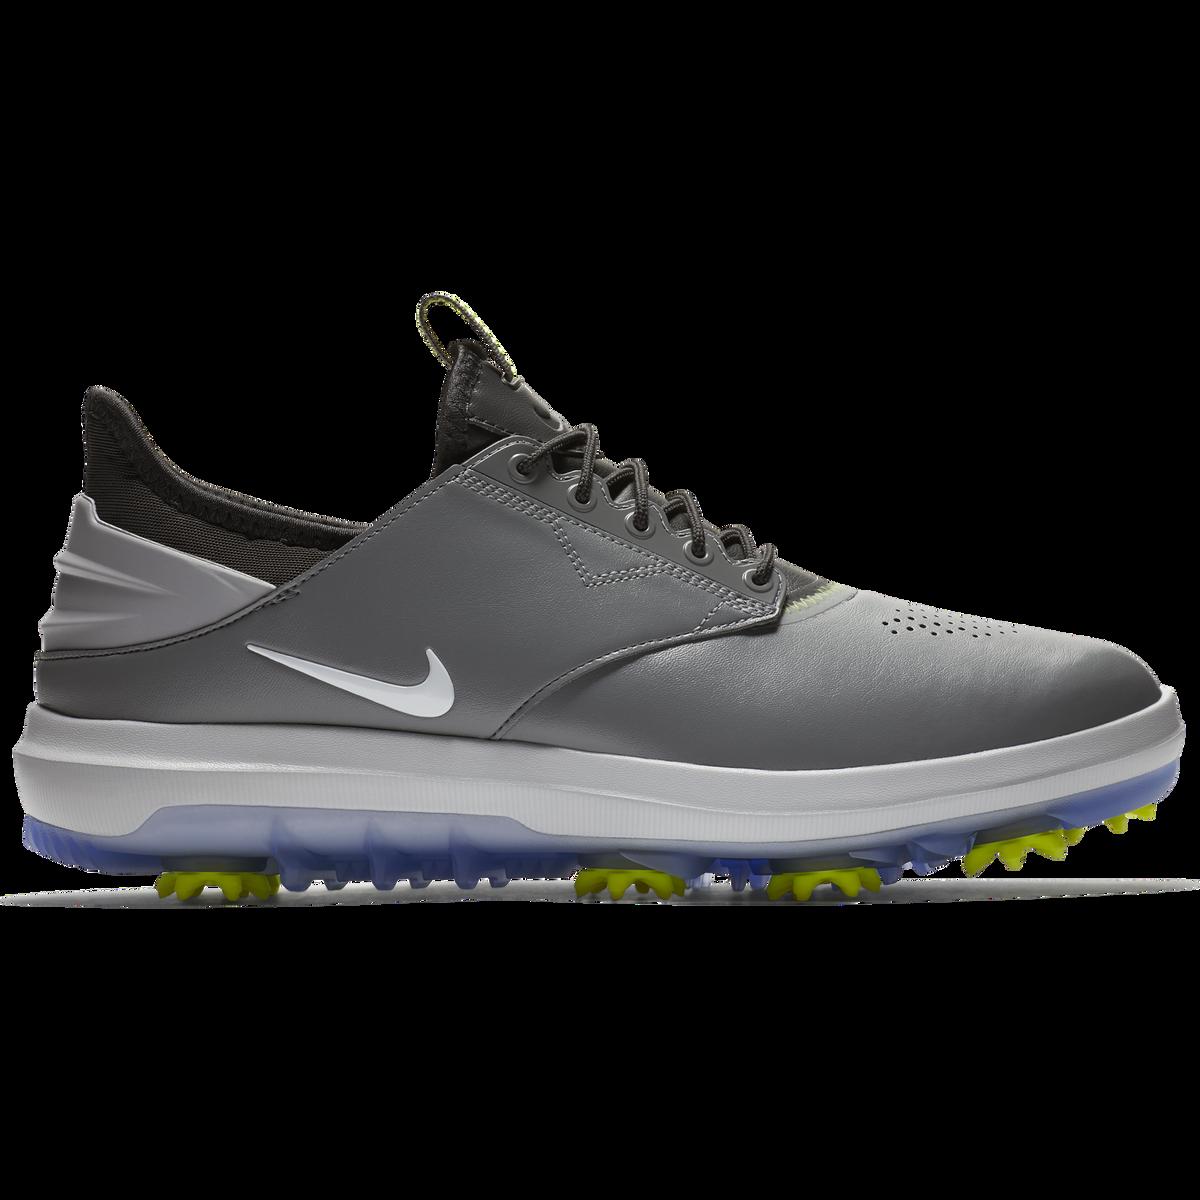 5b022e8f77b347 Images. Nike Air Zoom Direct Men  39 s Golf Shoe ...